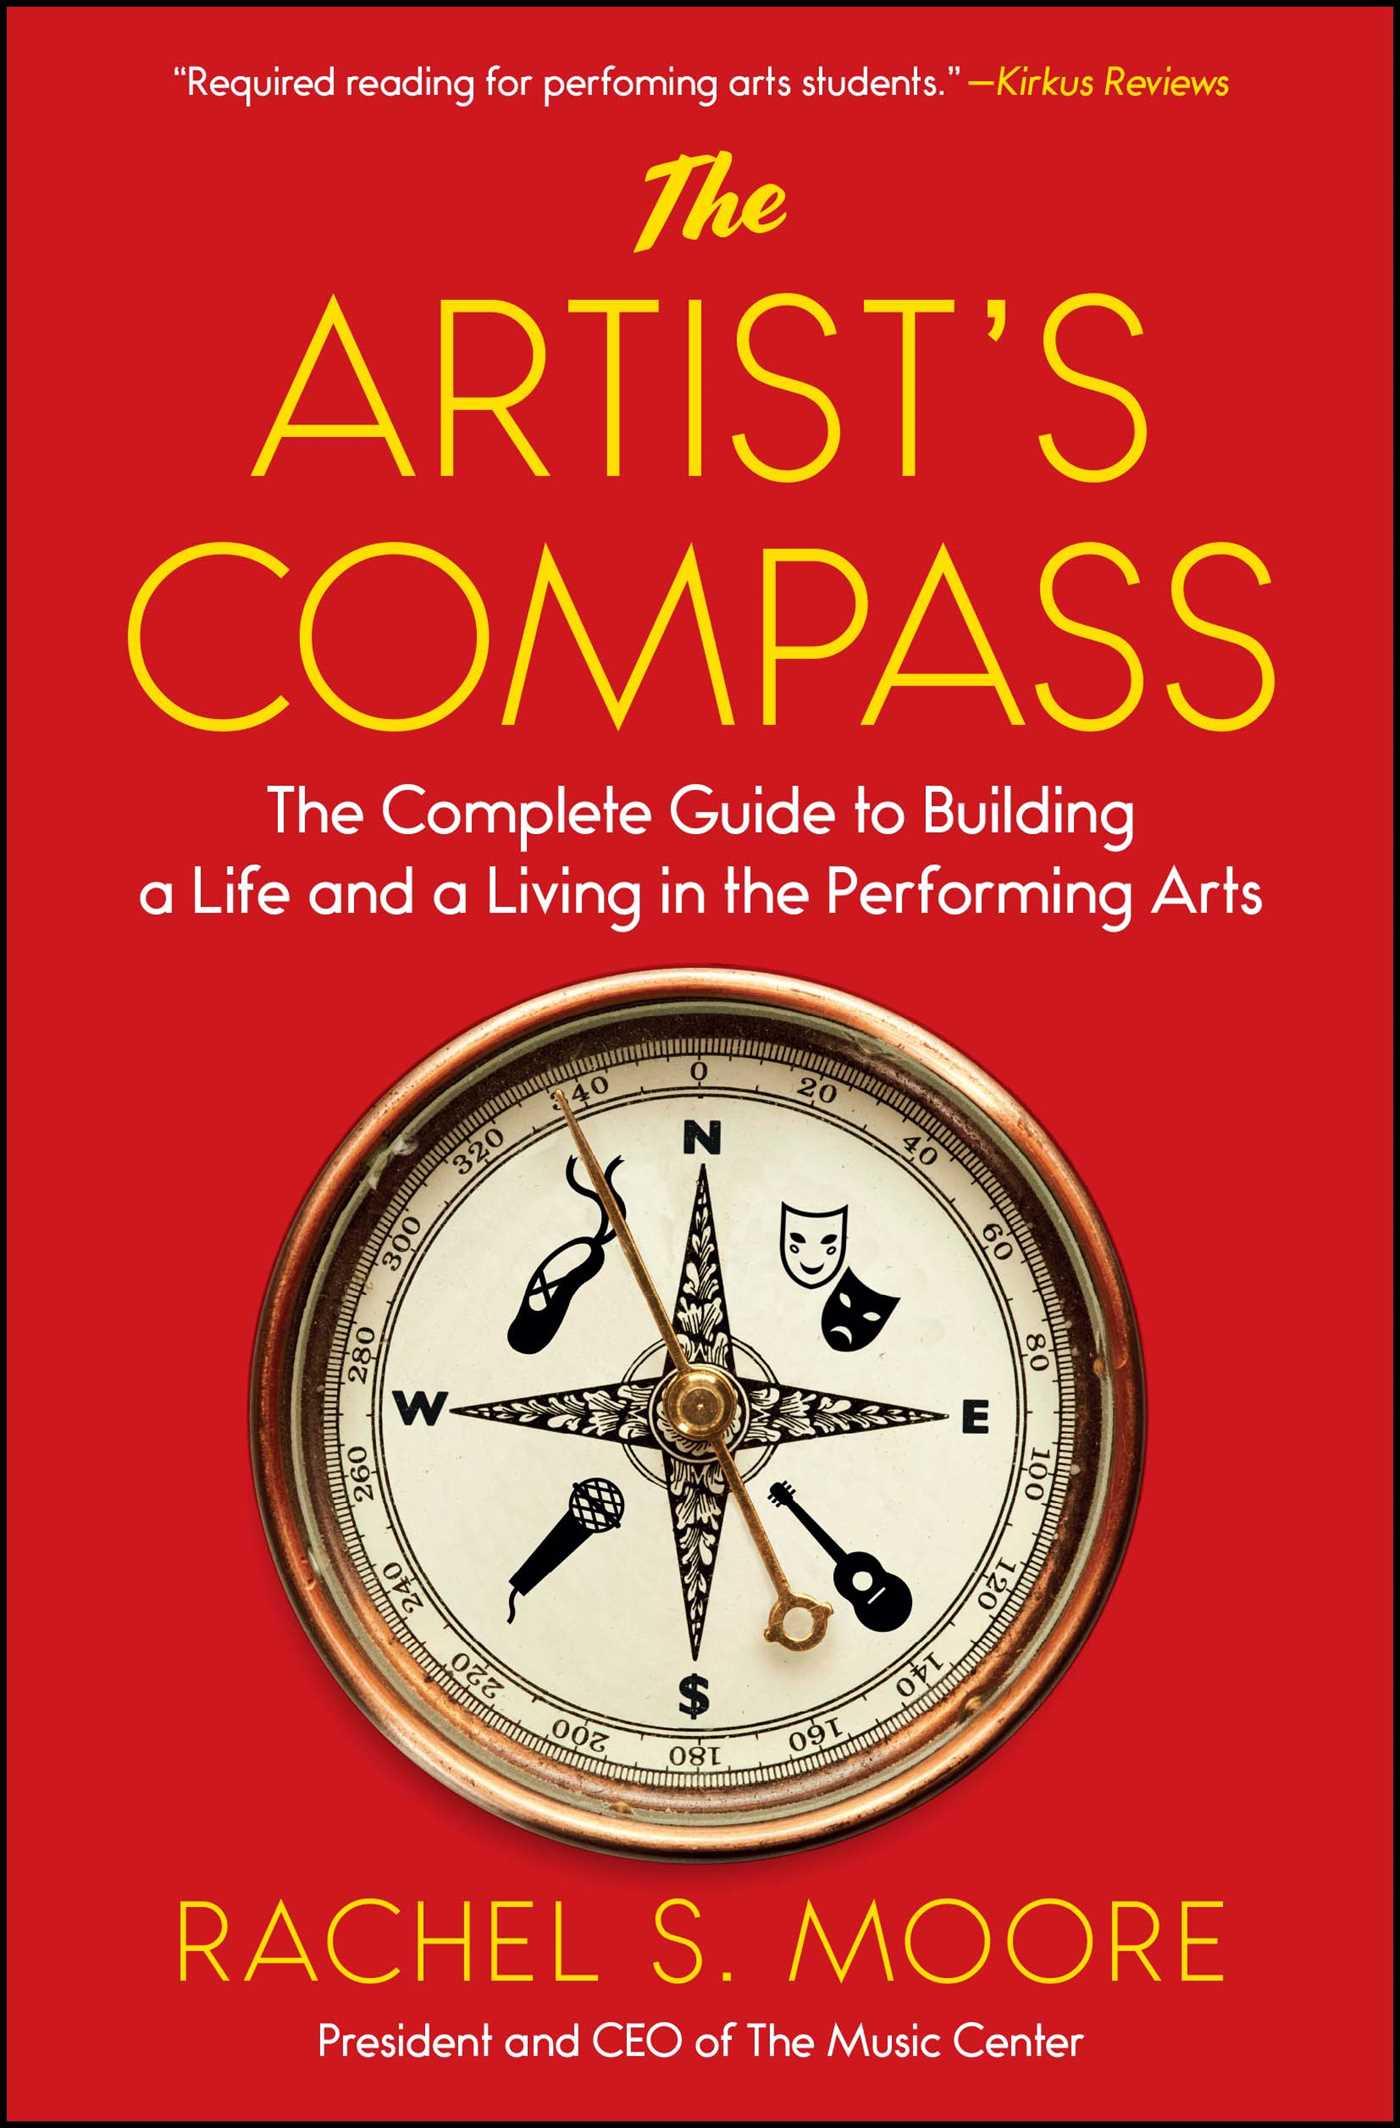 The artists compass 9781501126642 hr